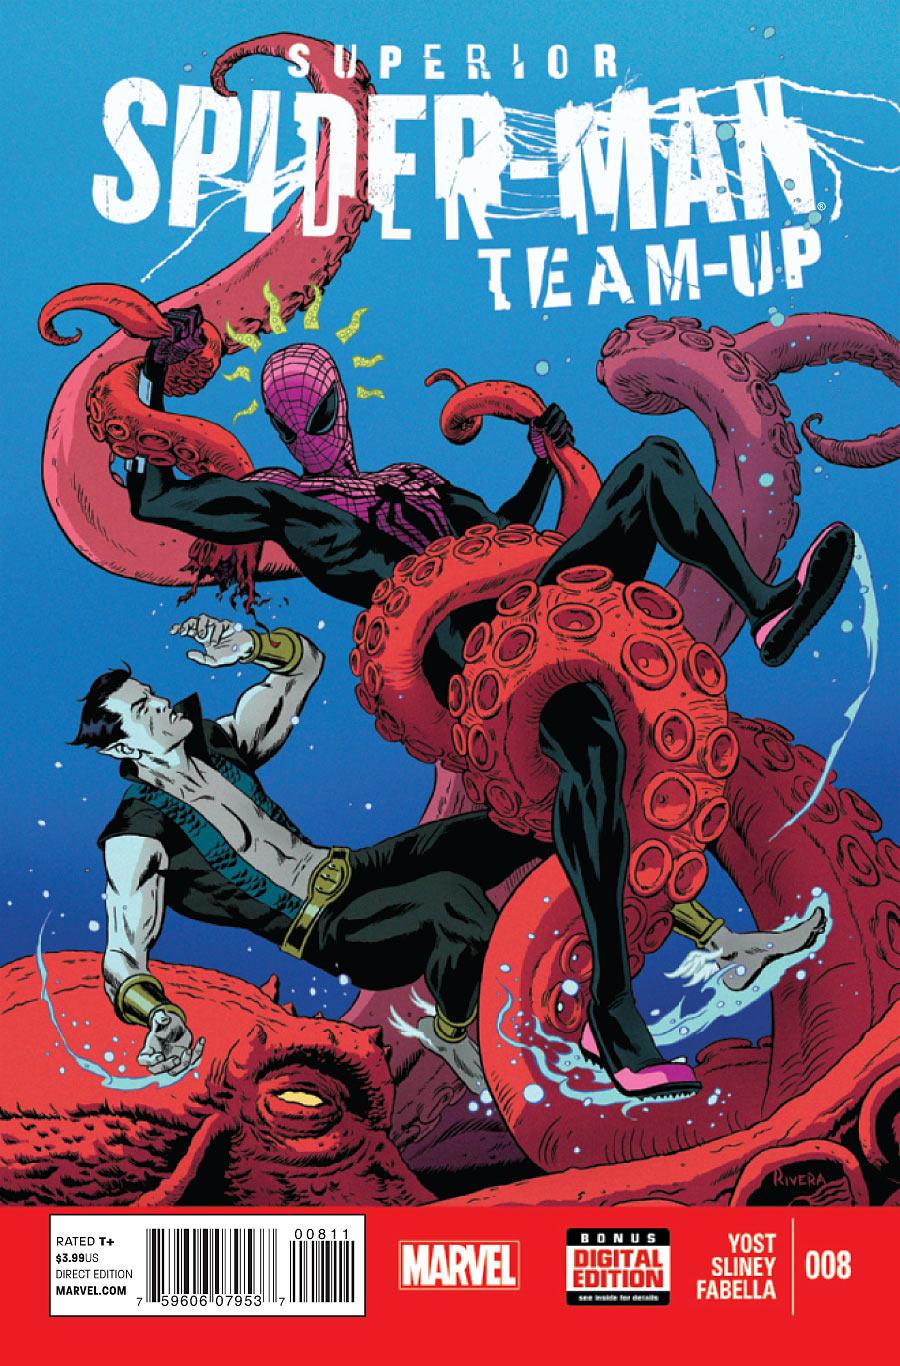 Superior spider man team up vol 1 8 marvel comics database